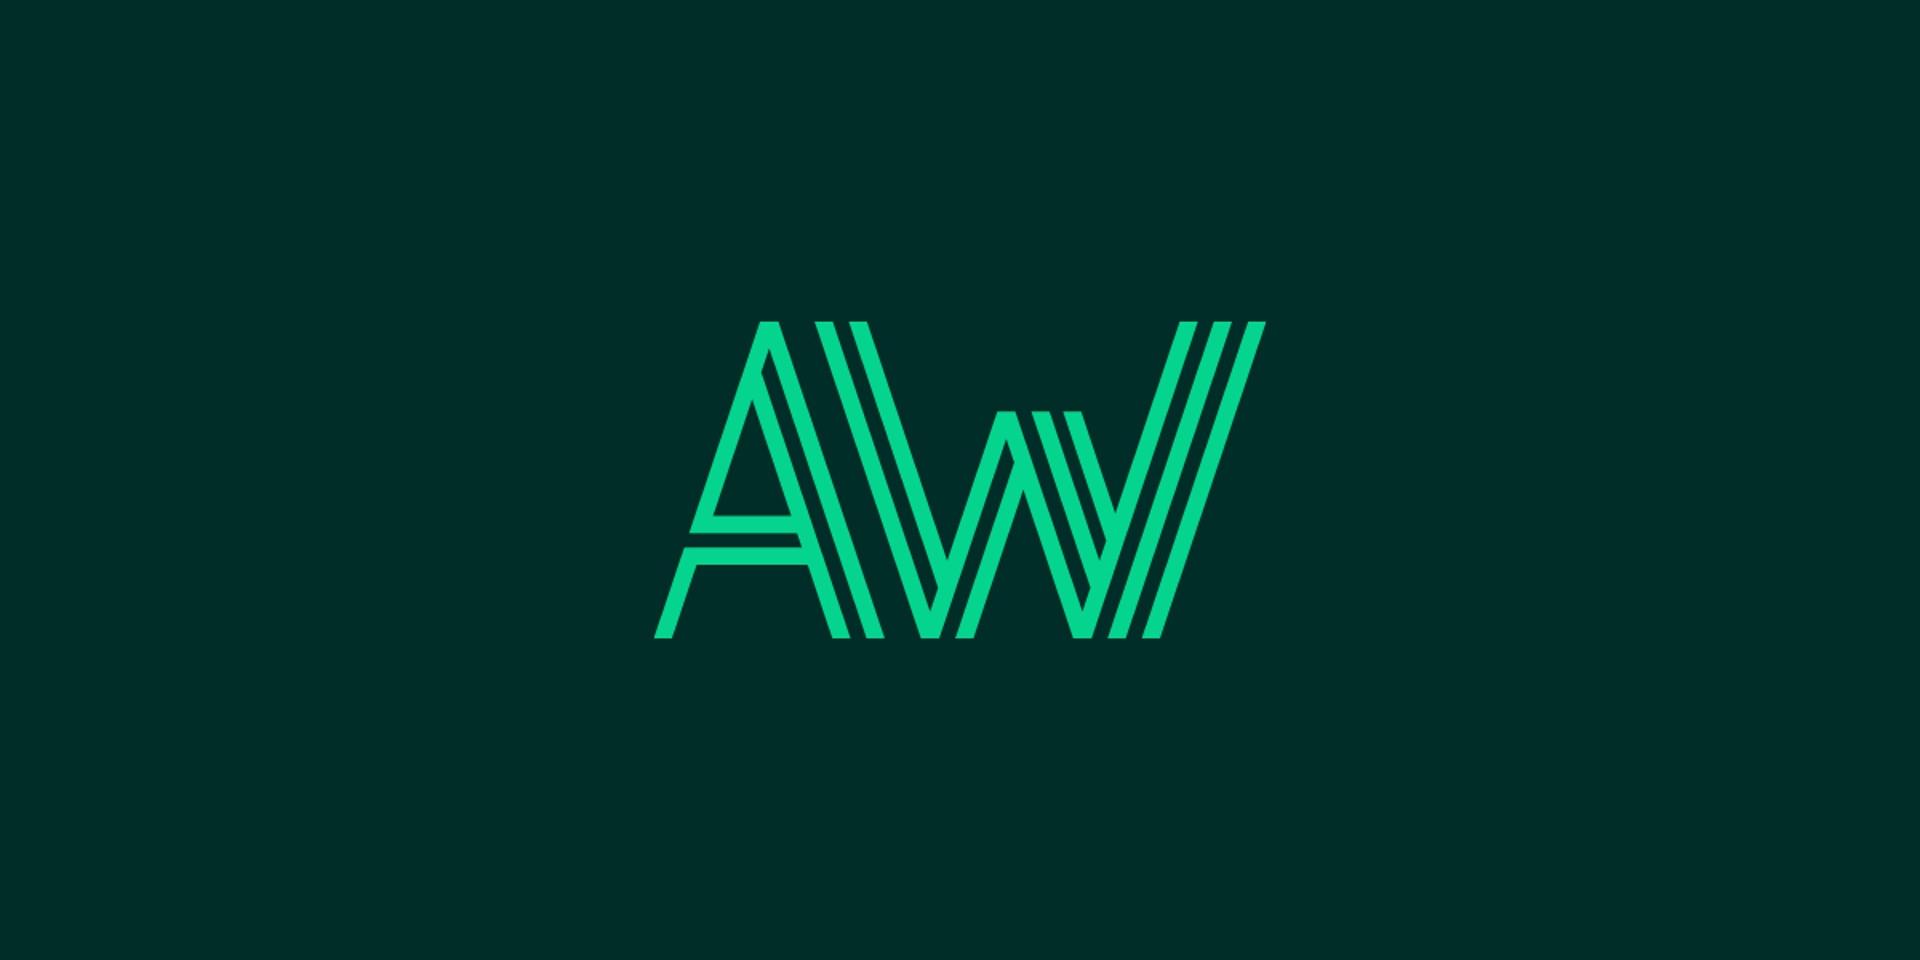 Academic_Work_uusi_ilme